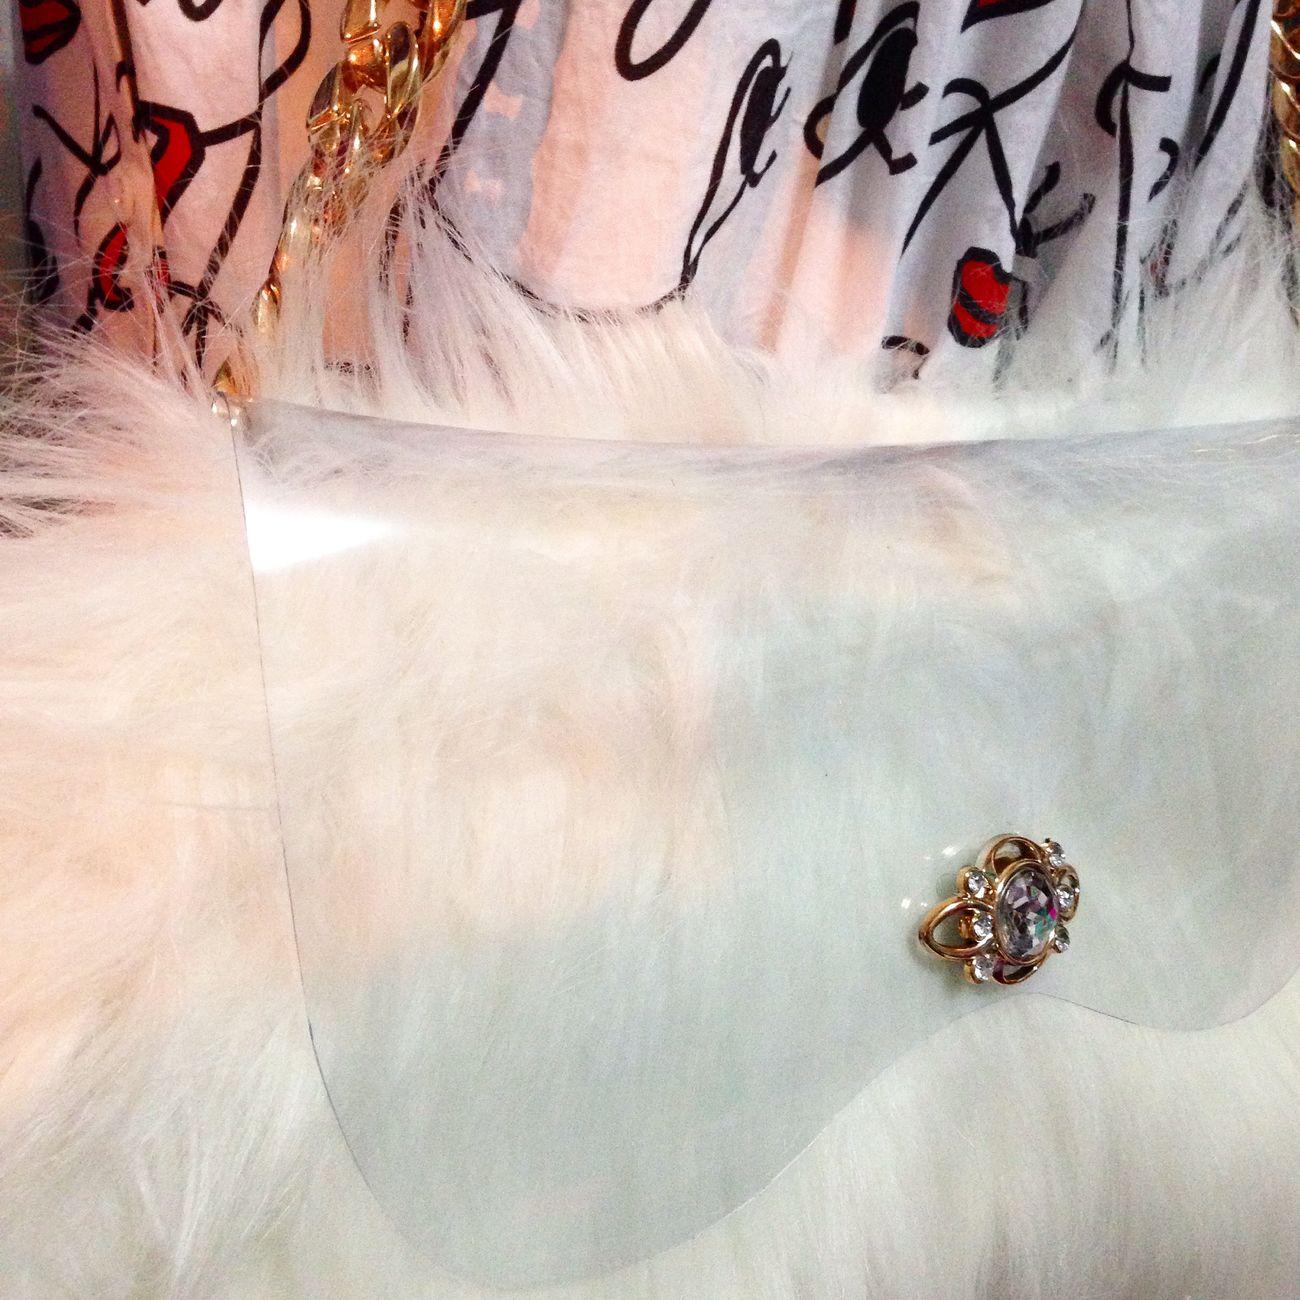 Laviniafenton Details New Bagdesigner Free Fashion Different Weird Instagood Plastic